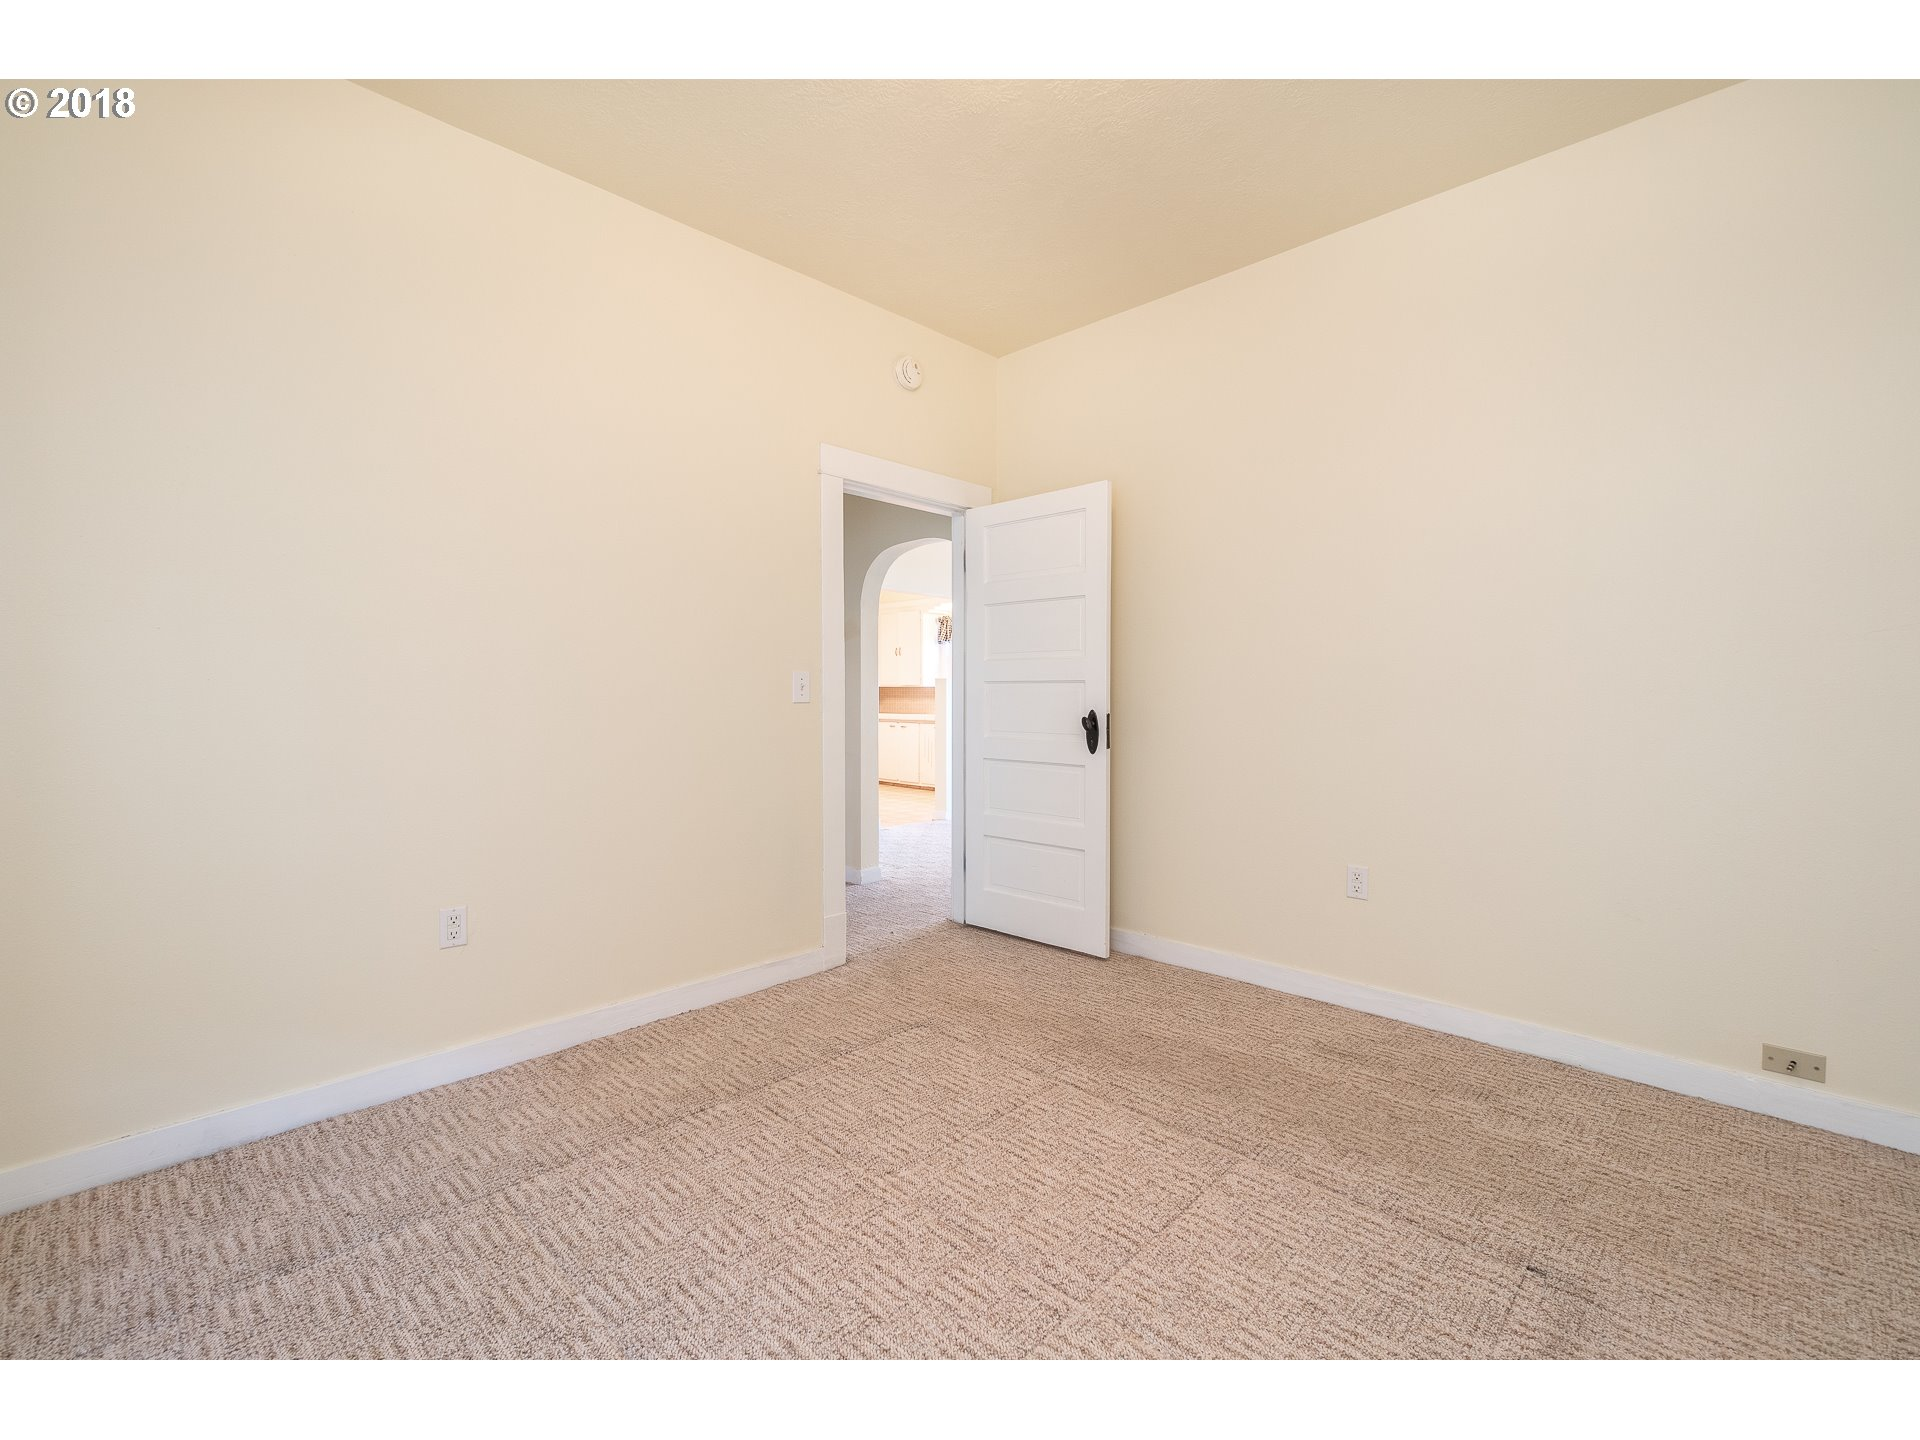 1131 HAYTER ST Dallas, OR 97338 - MLS #: 18019373